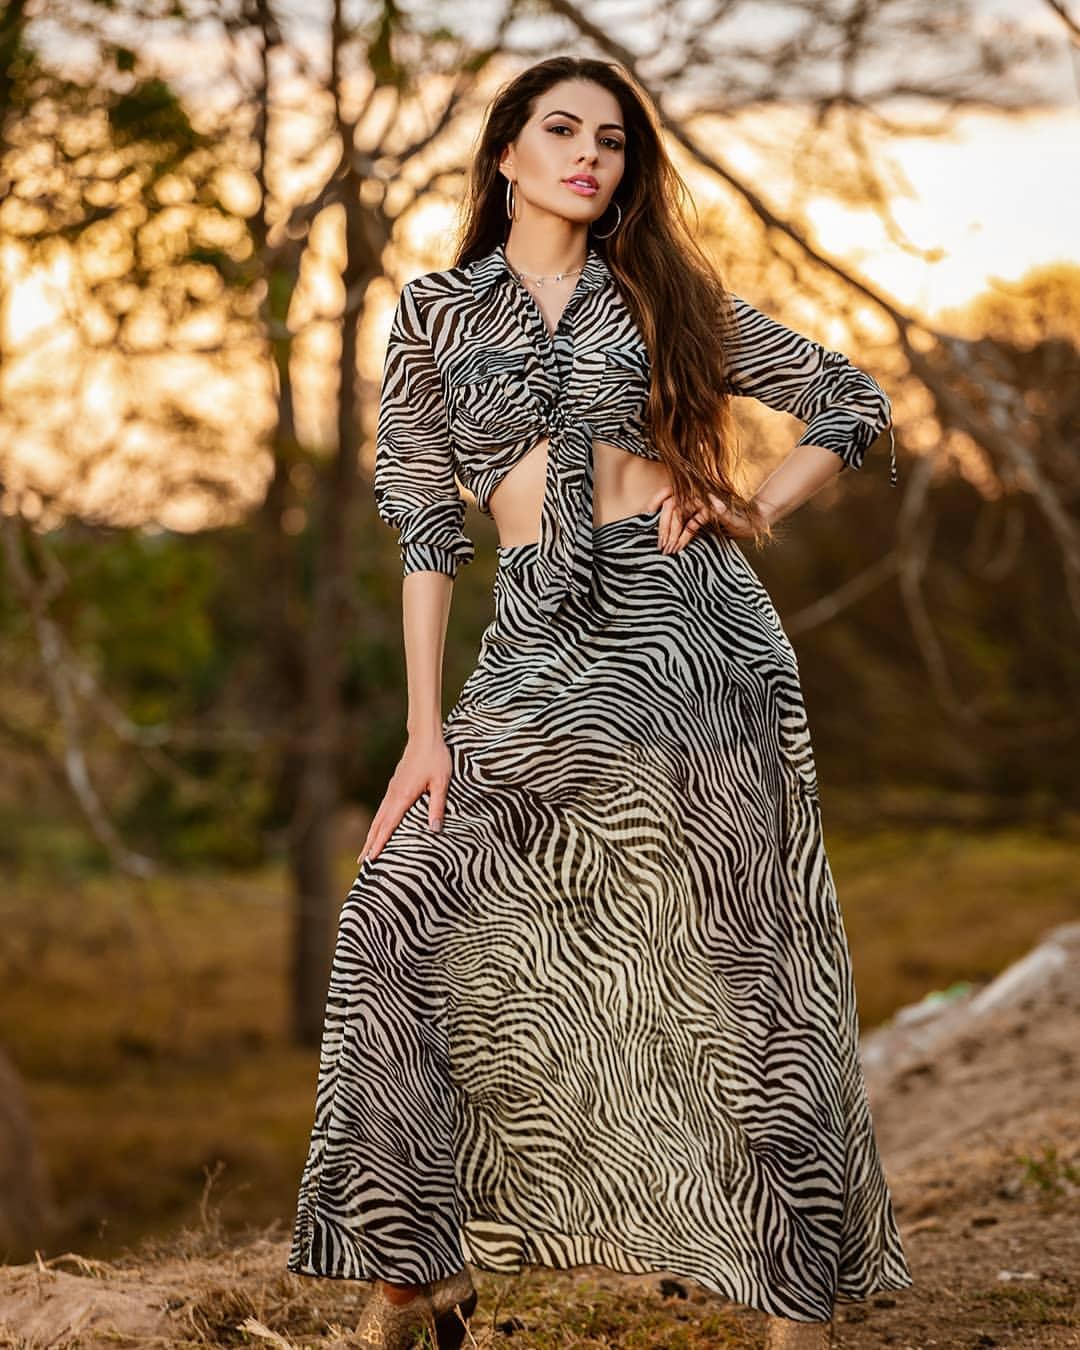 fabricia belford, top 10 de miss brasil mundo 2019. - Página 2 13081164